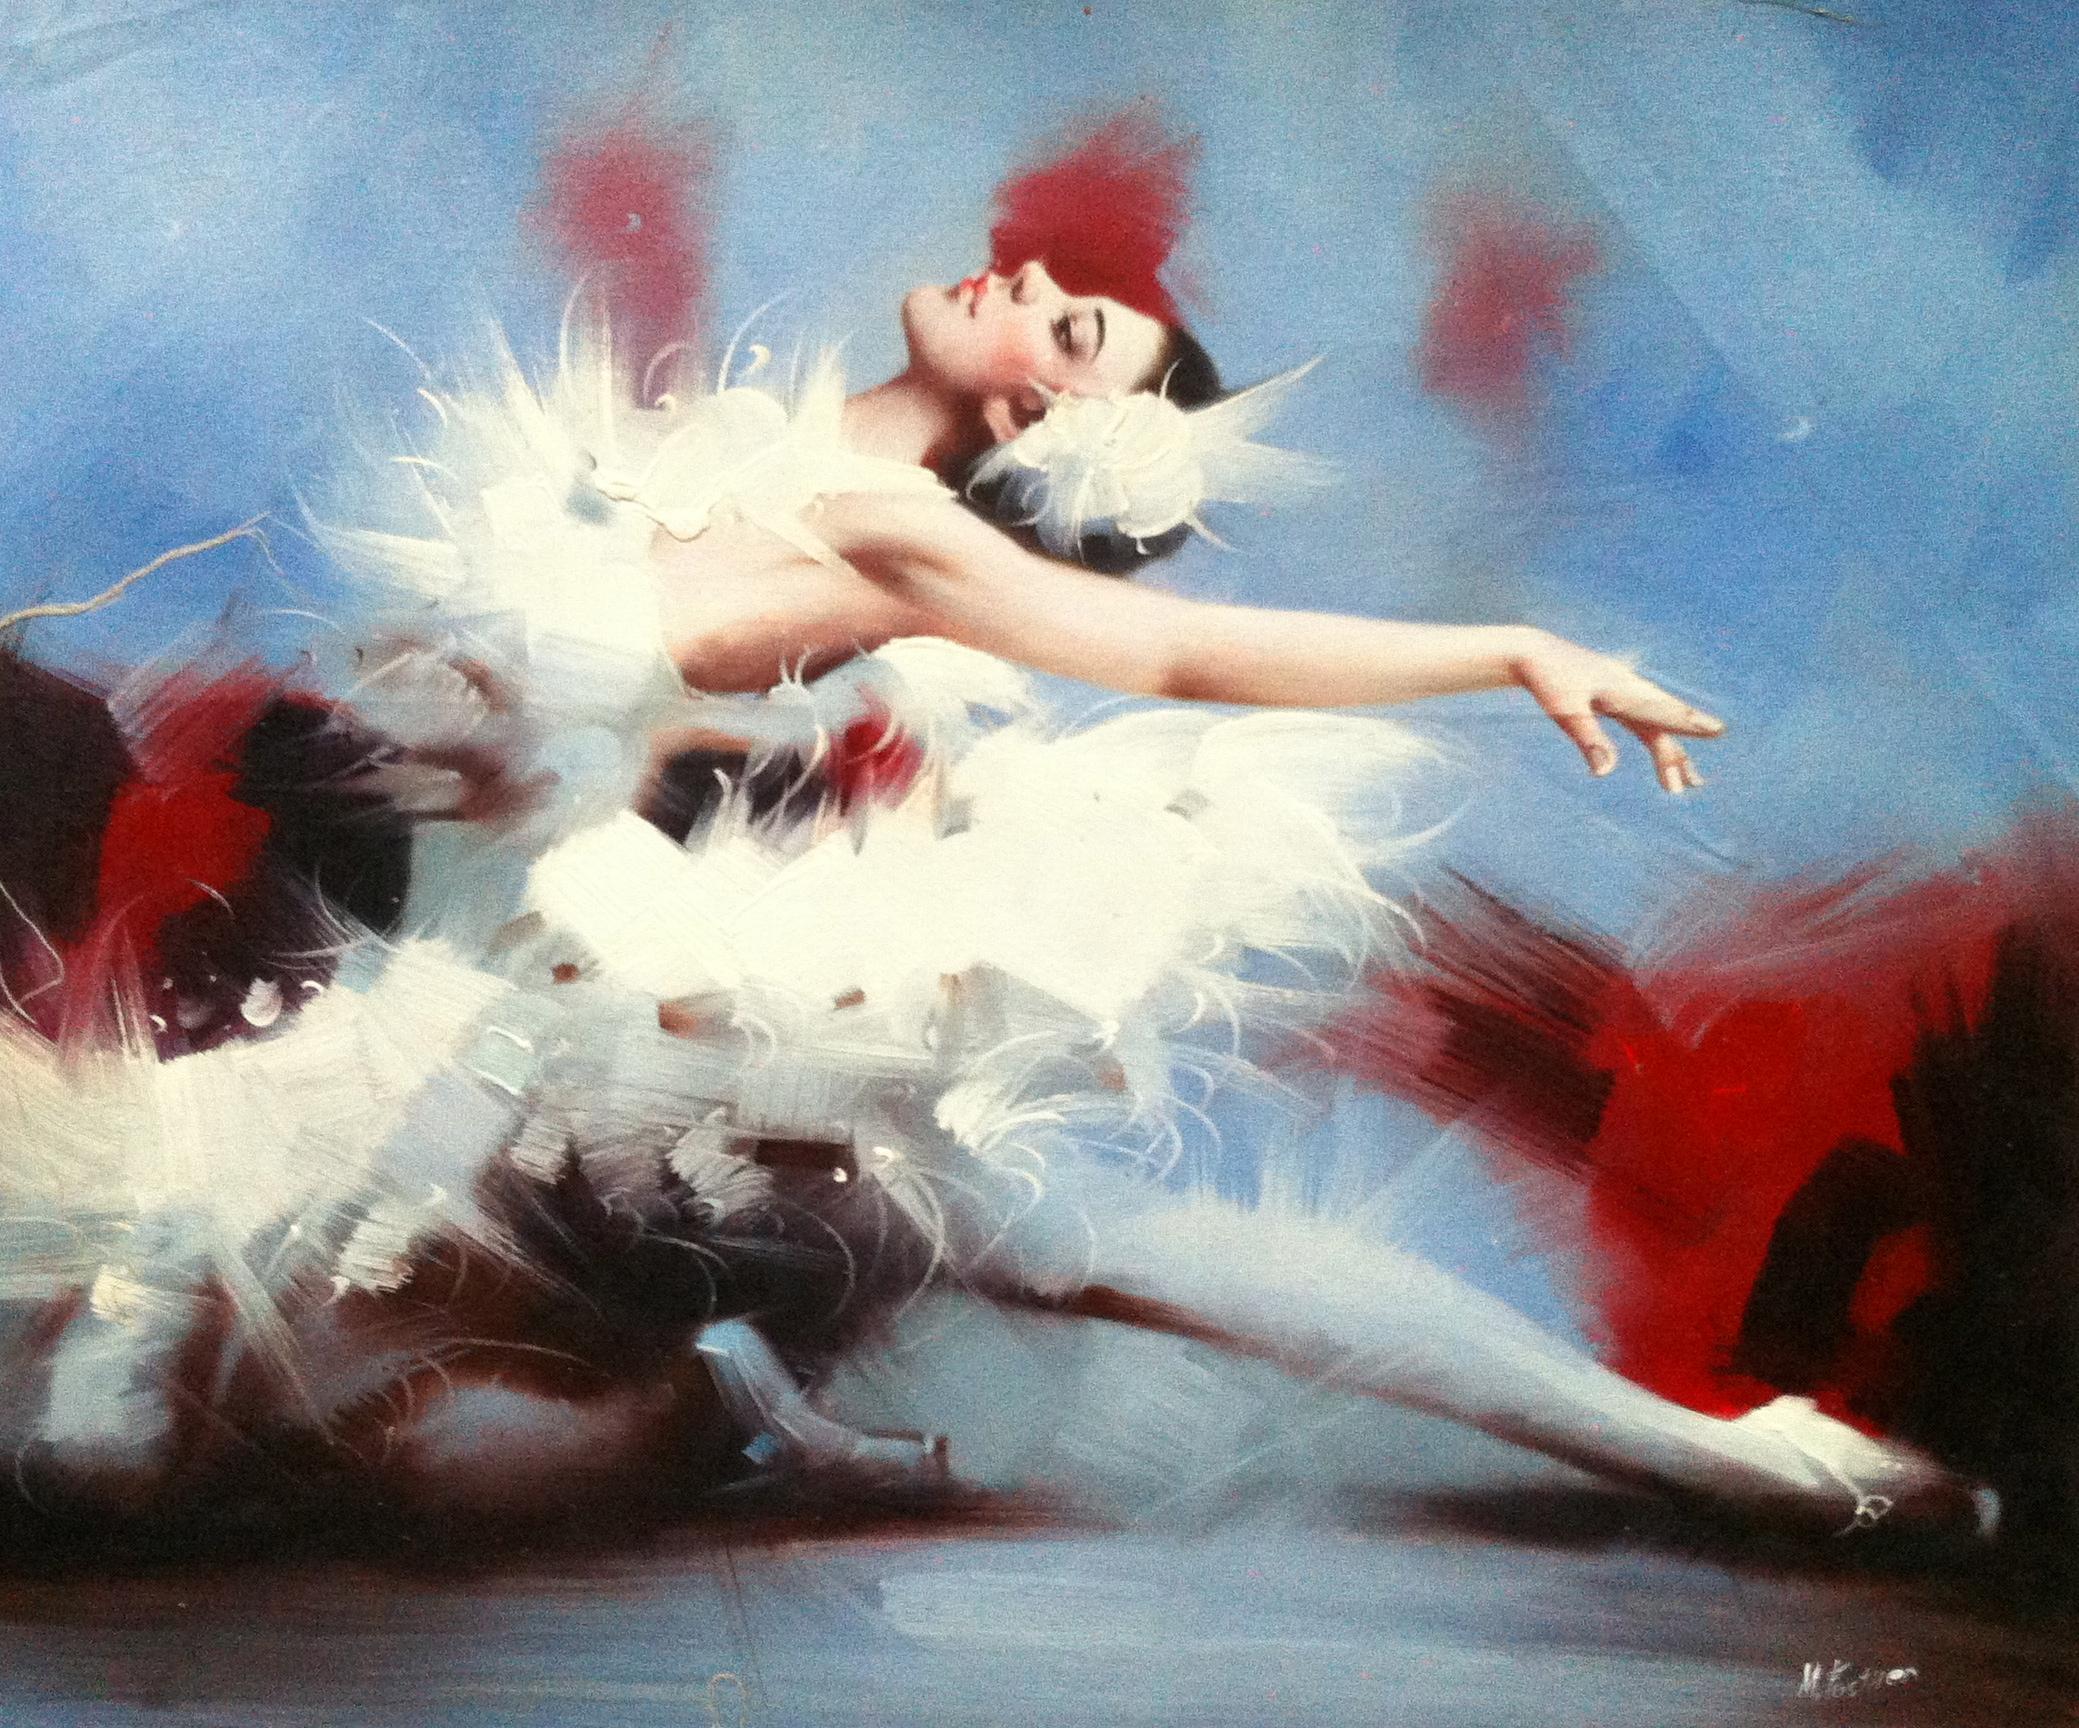 Fosthen балерина холст масло 50x60см 2012г